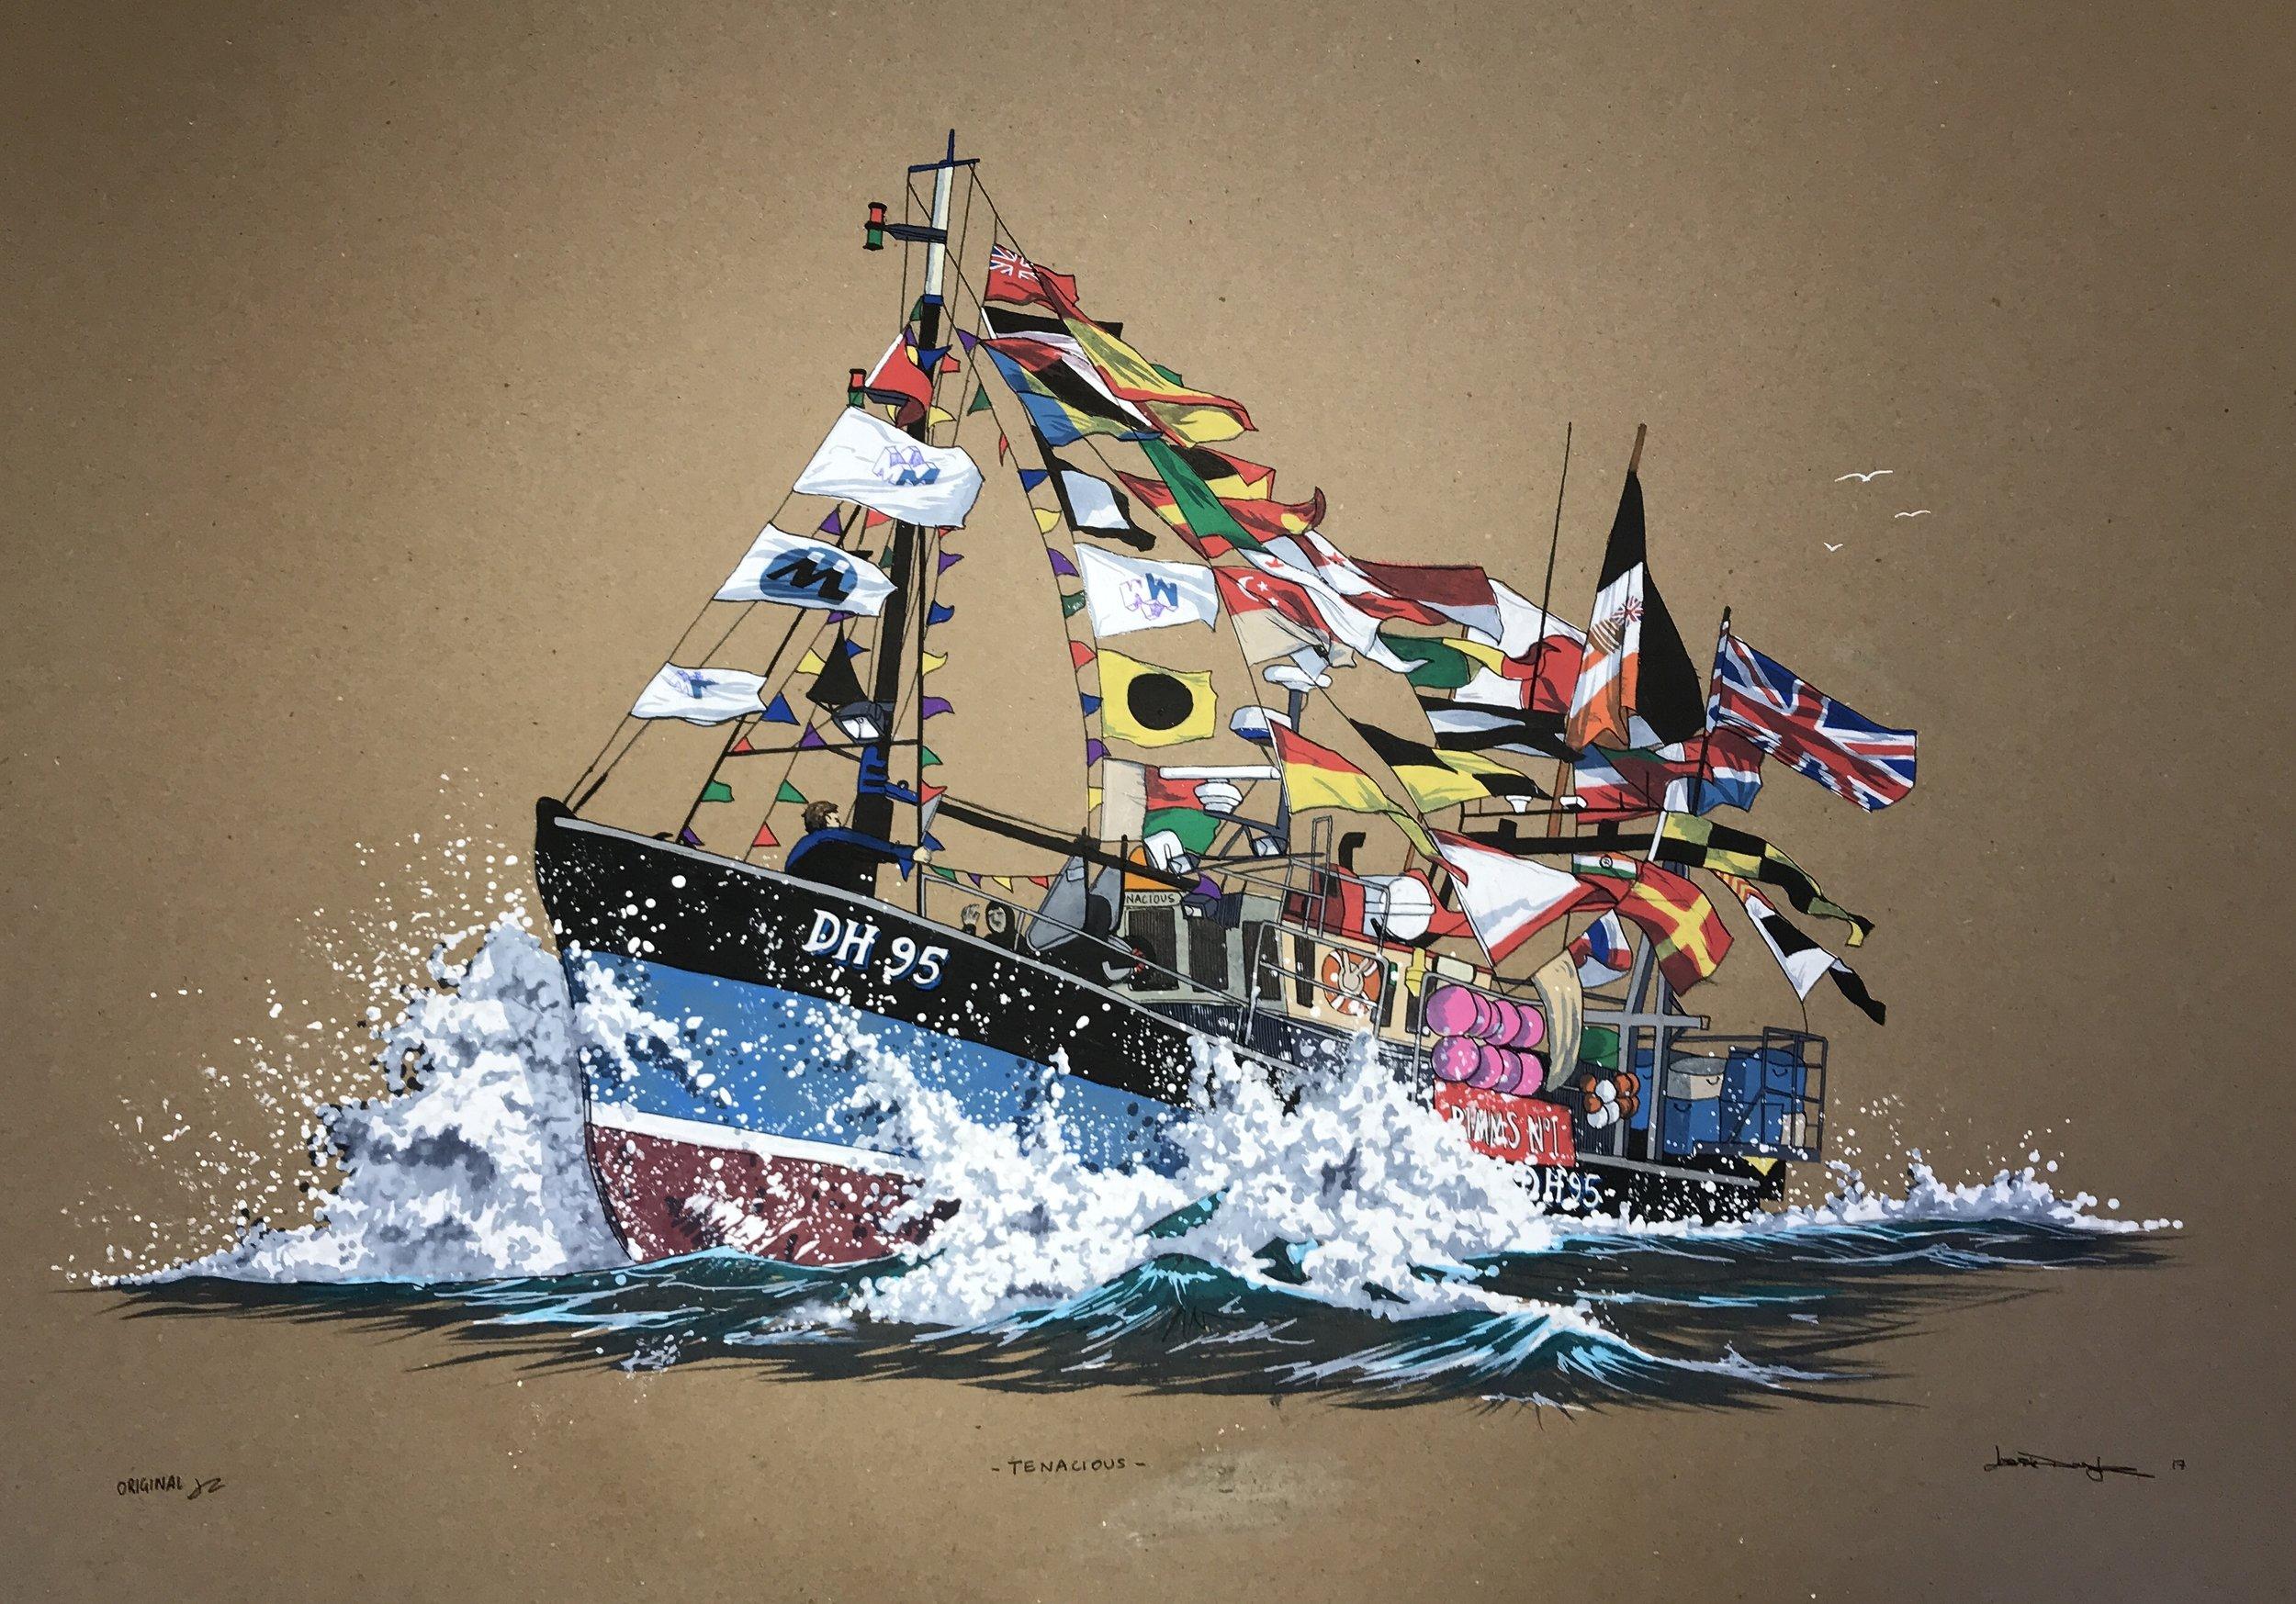 Jess Douglas, Salcombe Trawler Race, Acrylic Paint Pens - UNI Posca,, A2,  http://www.jessdouglas.com